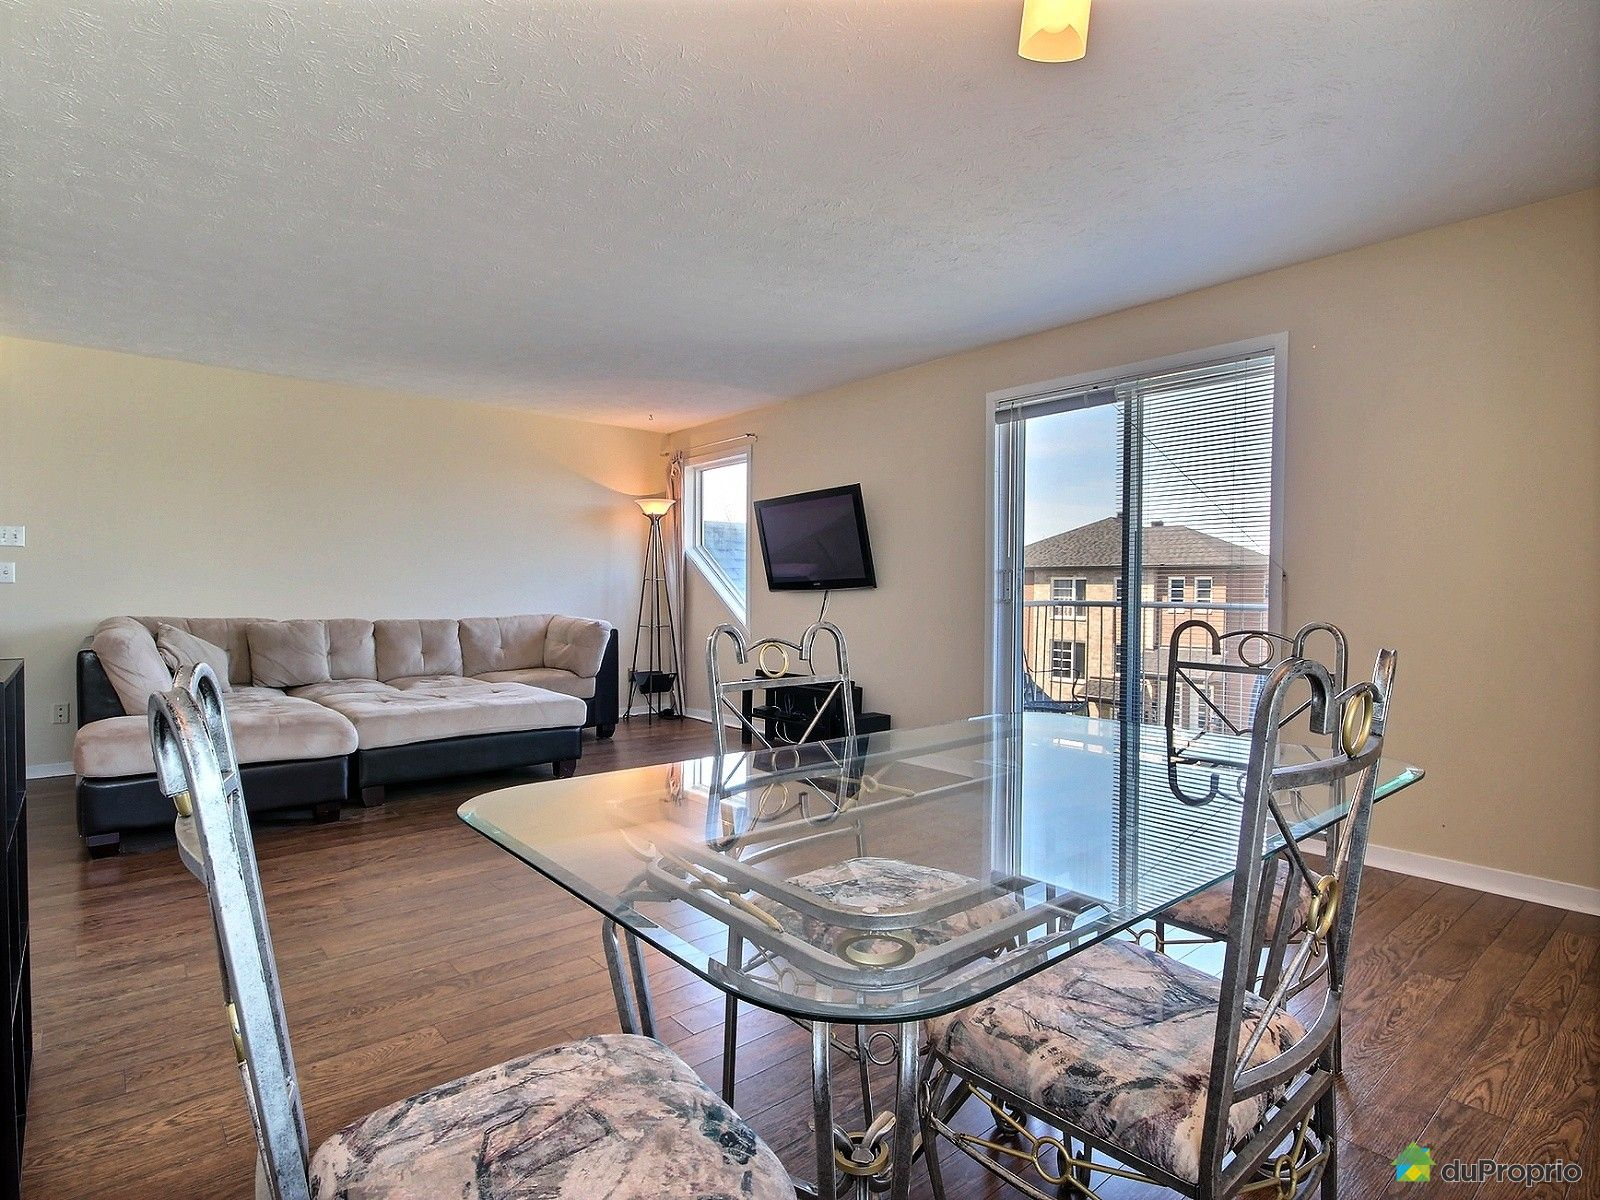 #446987 Condo à Vendre Chambly 5 1370 Rue Zotique Giard  3891 salle a manger pas cher montreal 1600x1200 px @ aertt.com